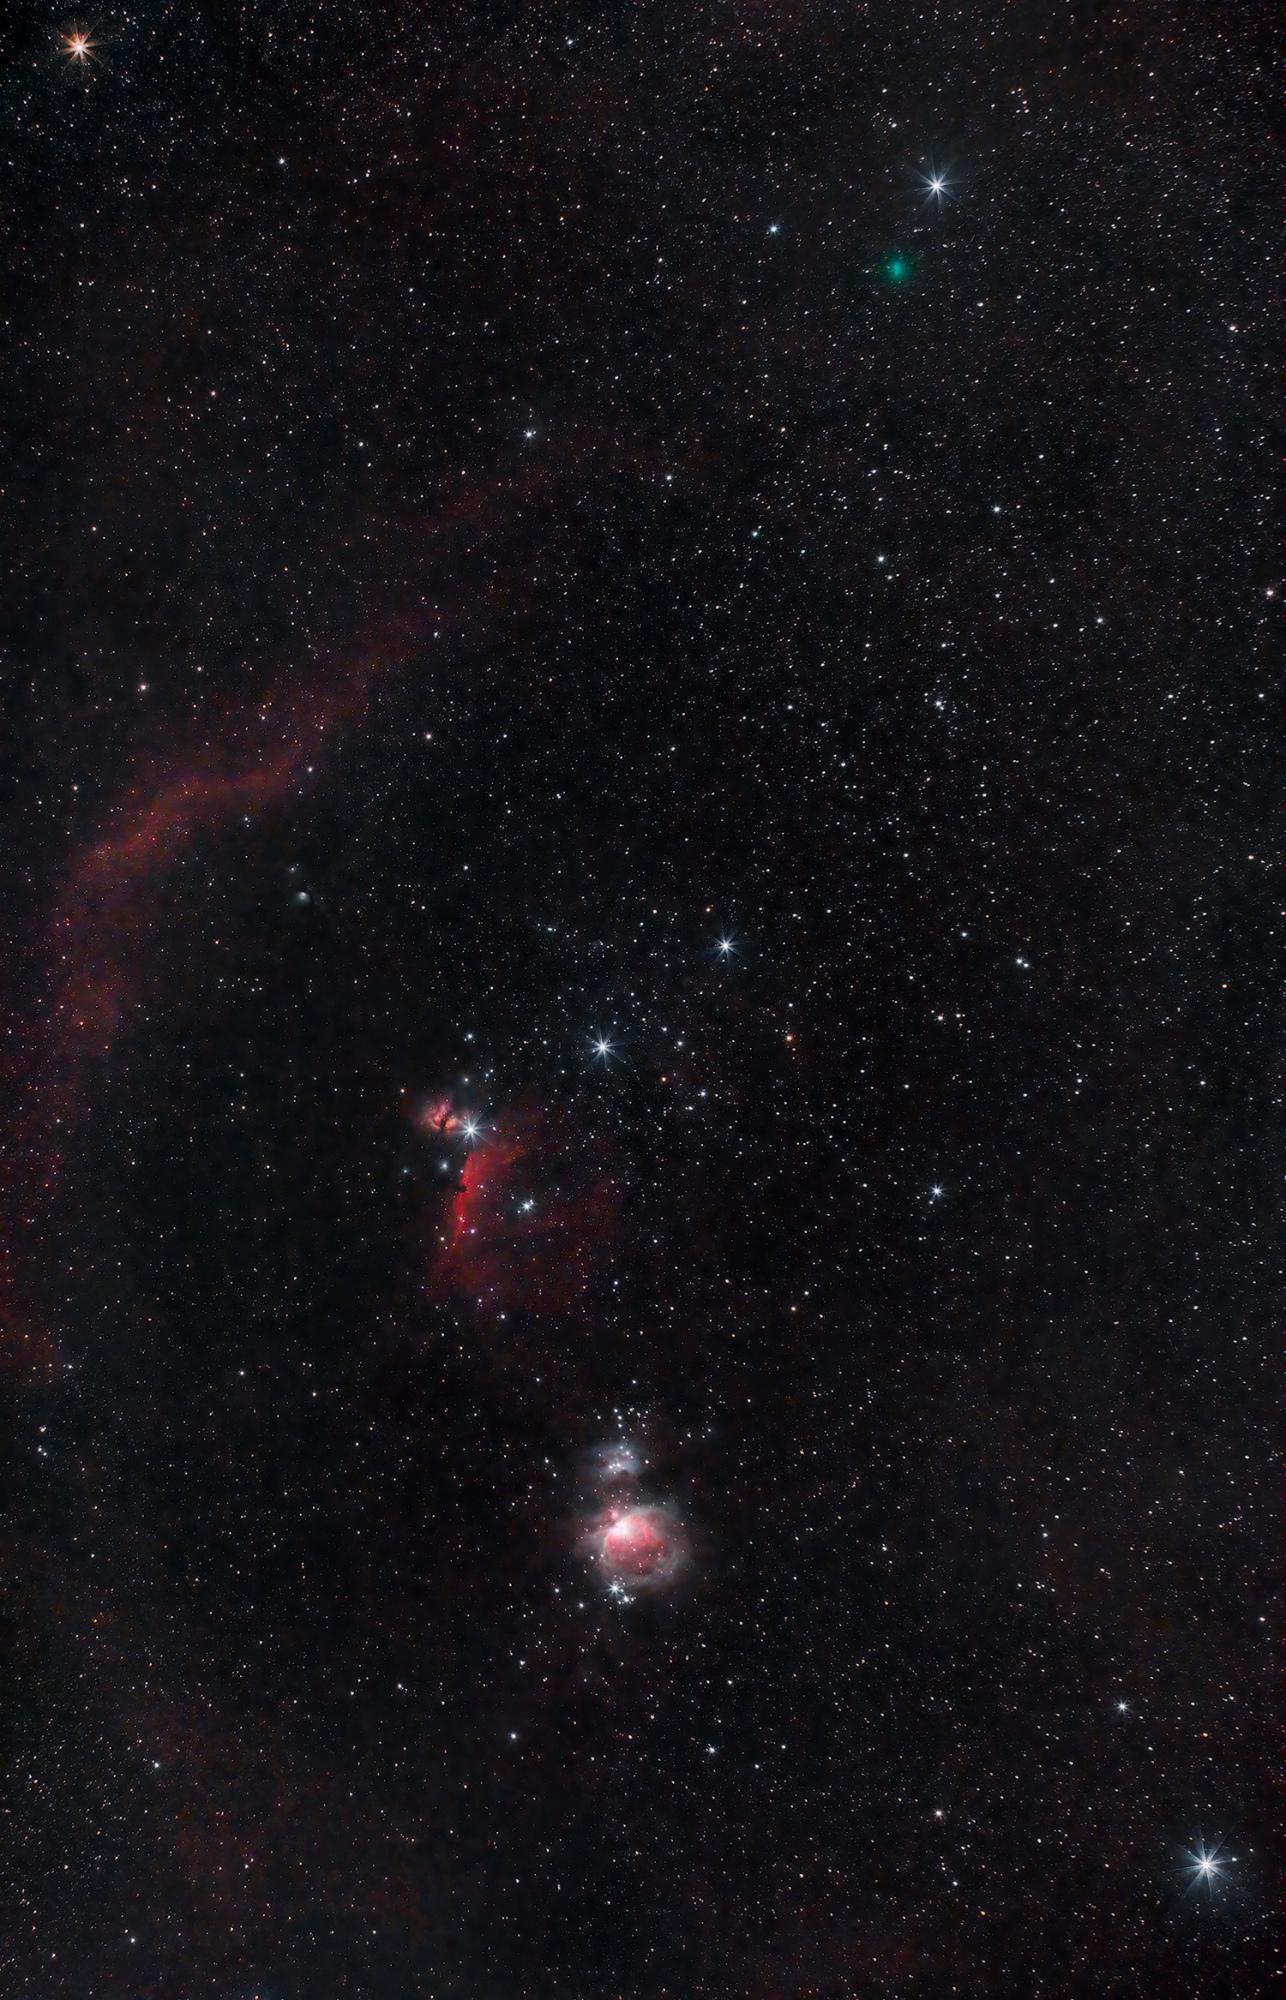 OrionCompletATLAS.thumb.jpg.d1e3aecece1969daeb73721355ca77c8.jpg